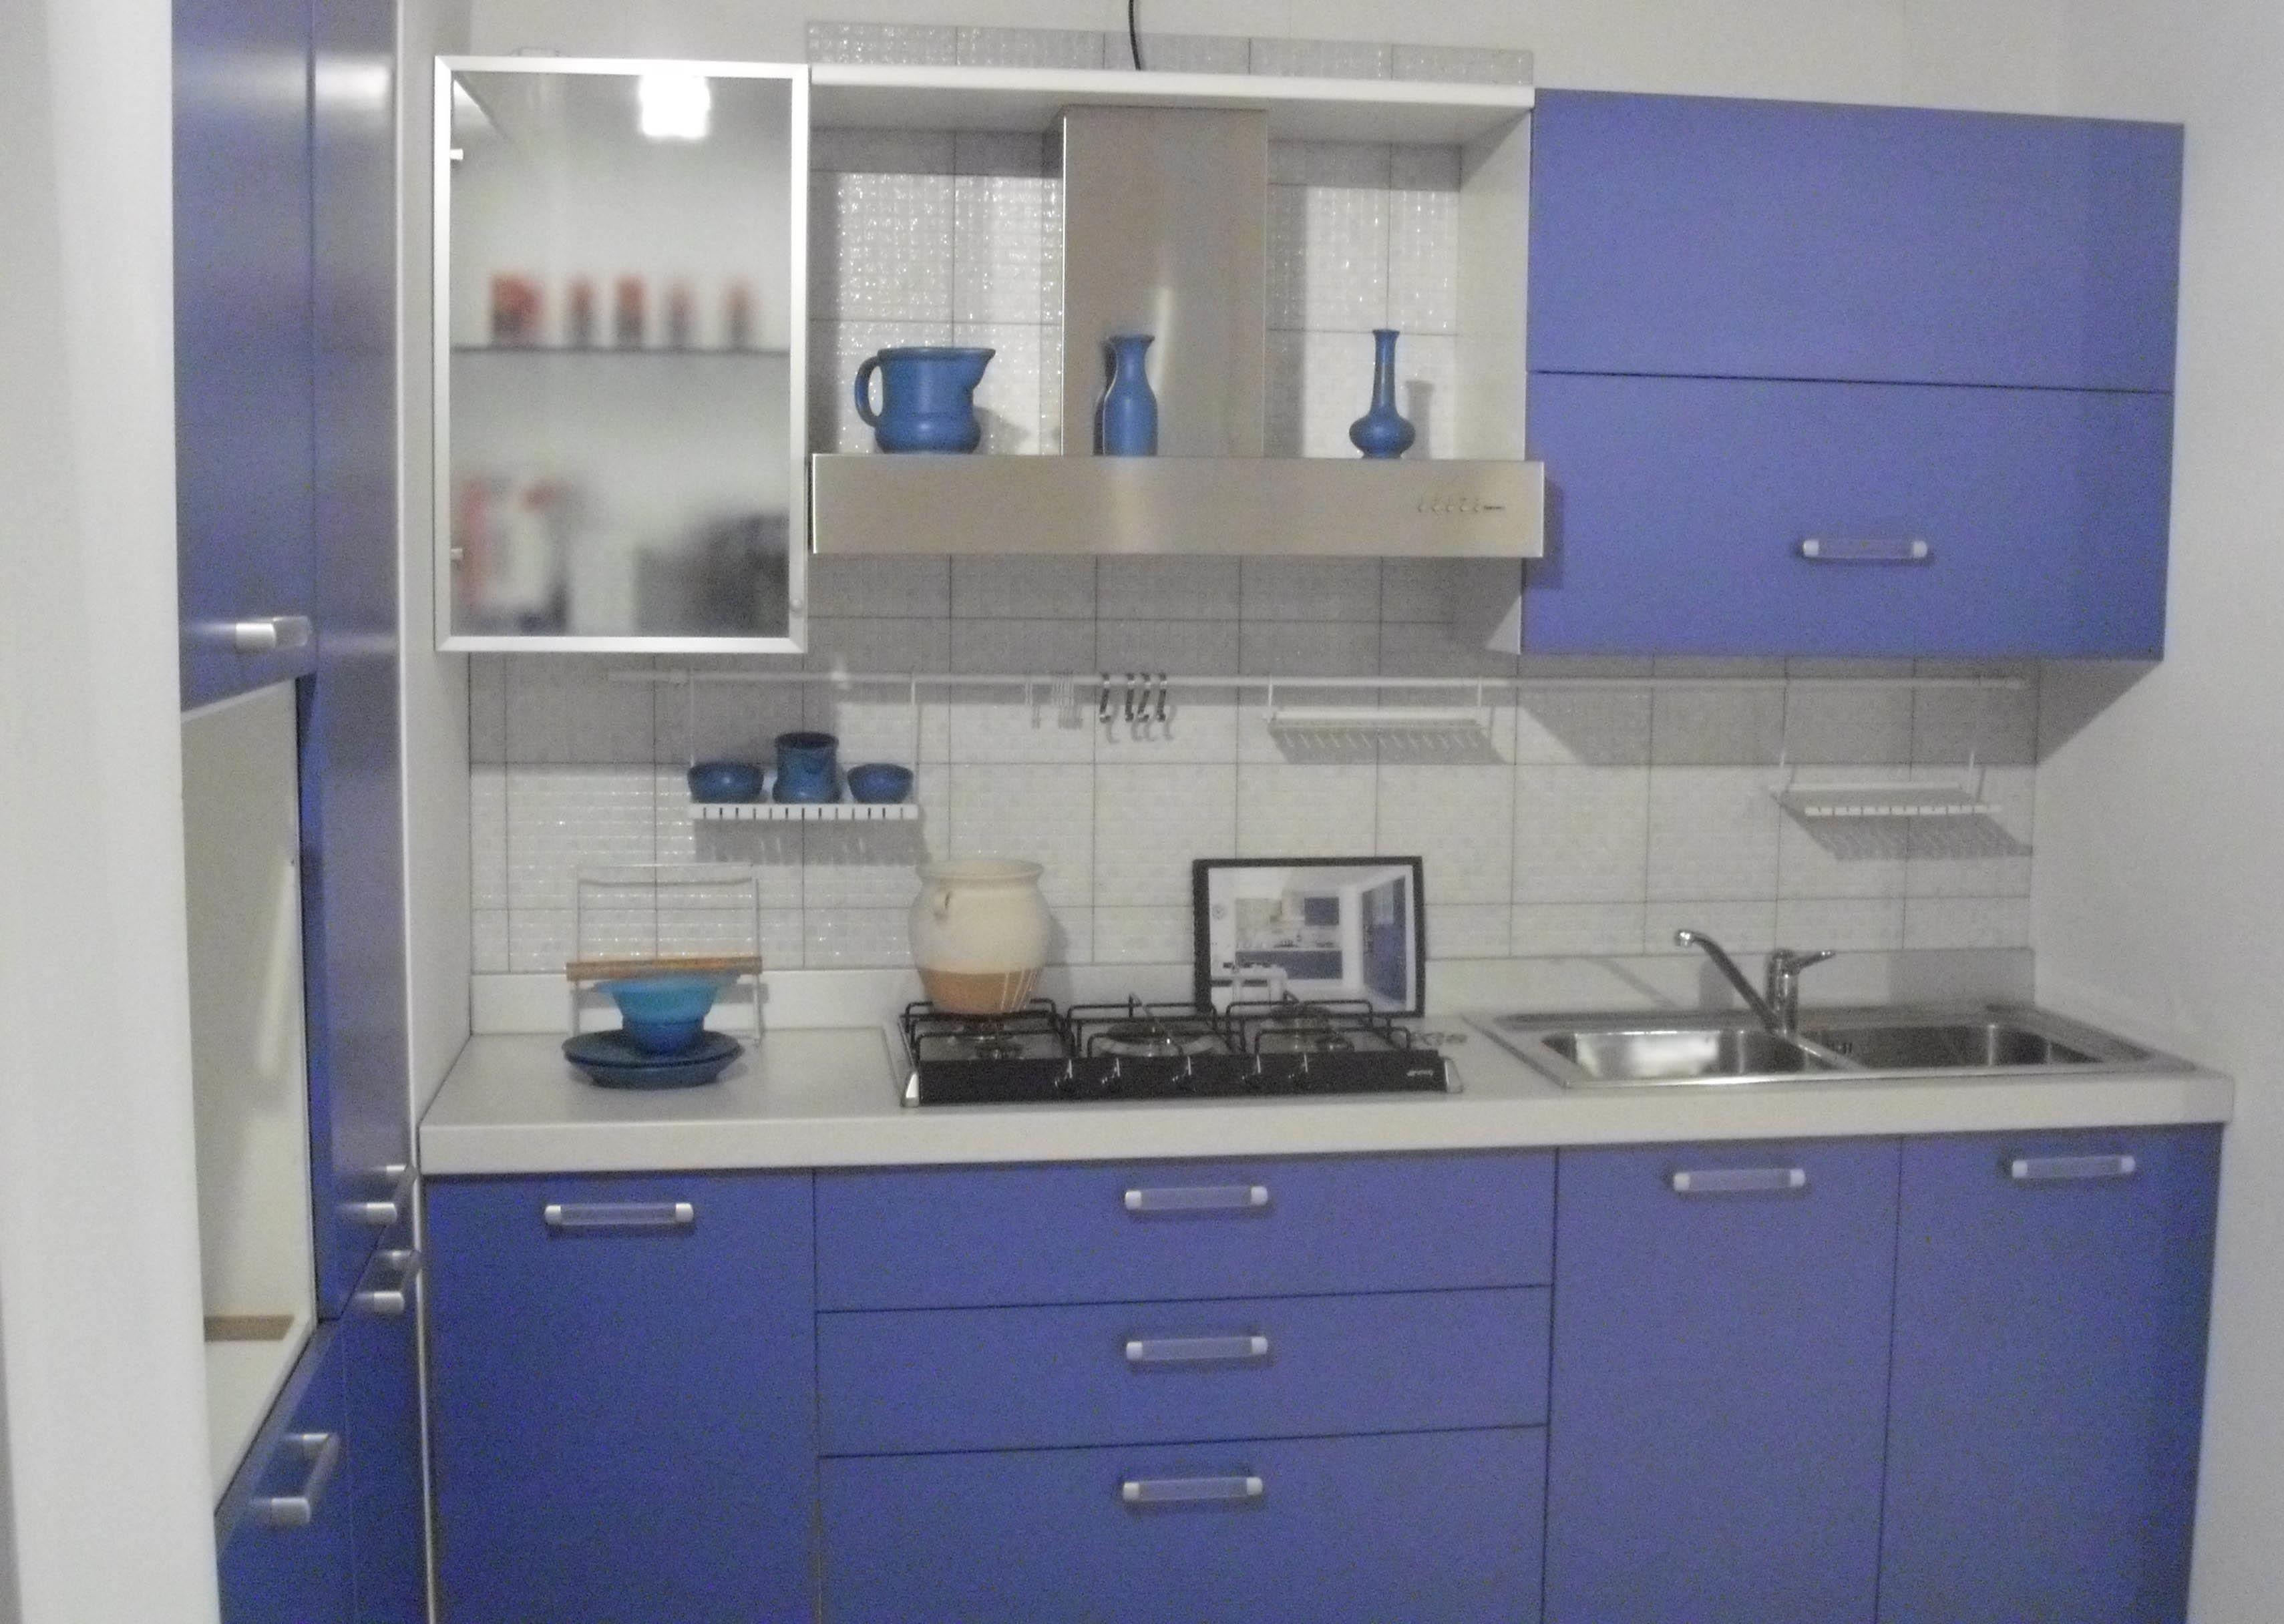 Cucina novadue cucine laminato cucine a prezzi scontati - Laminato in cucina ...